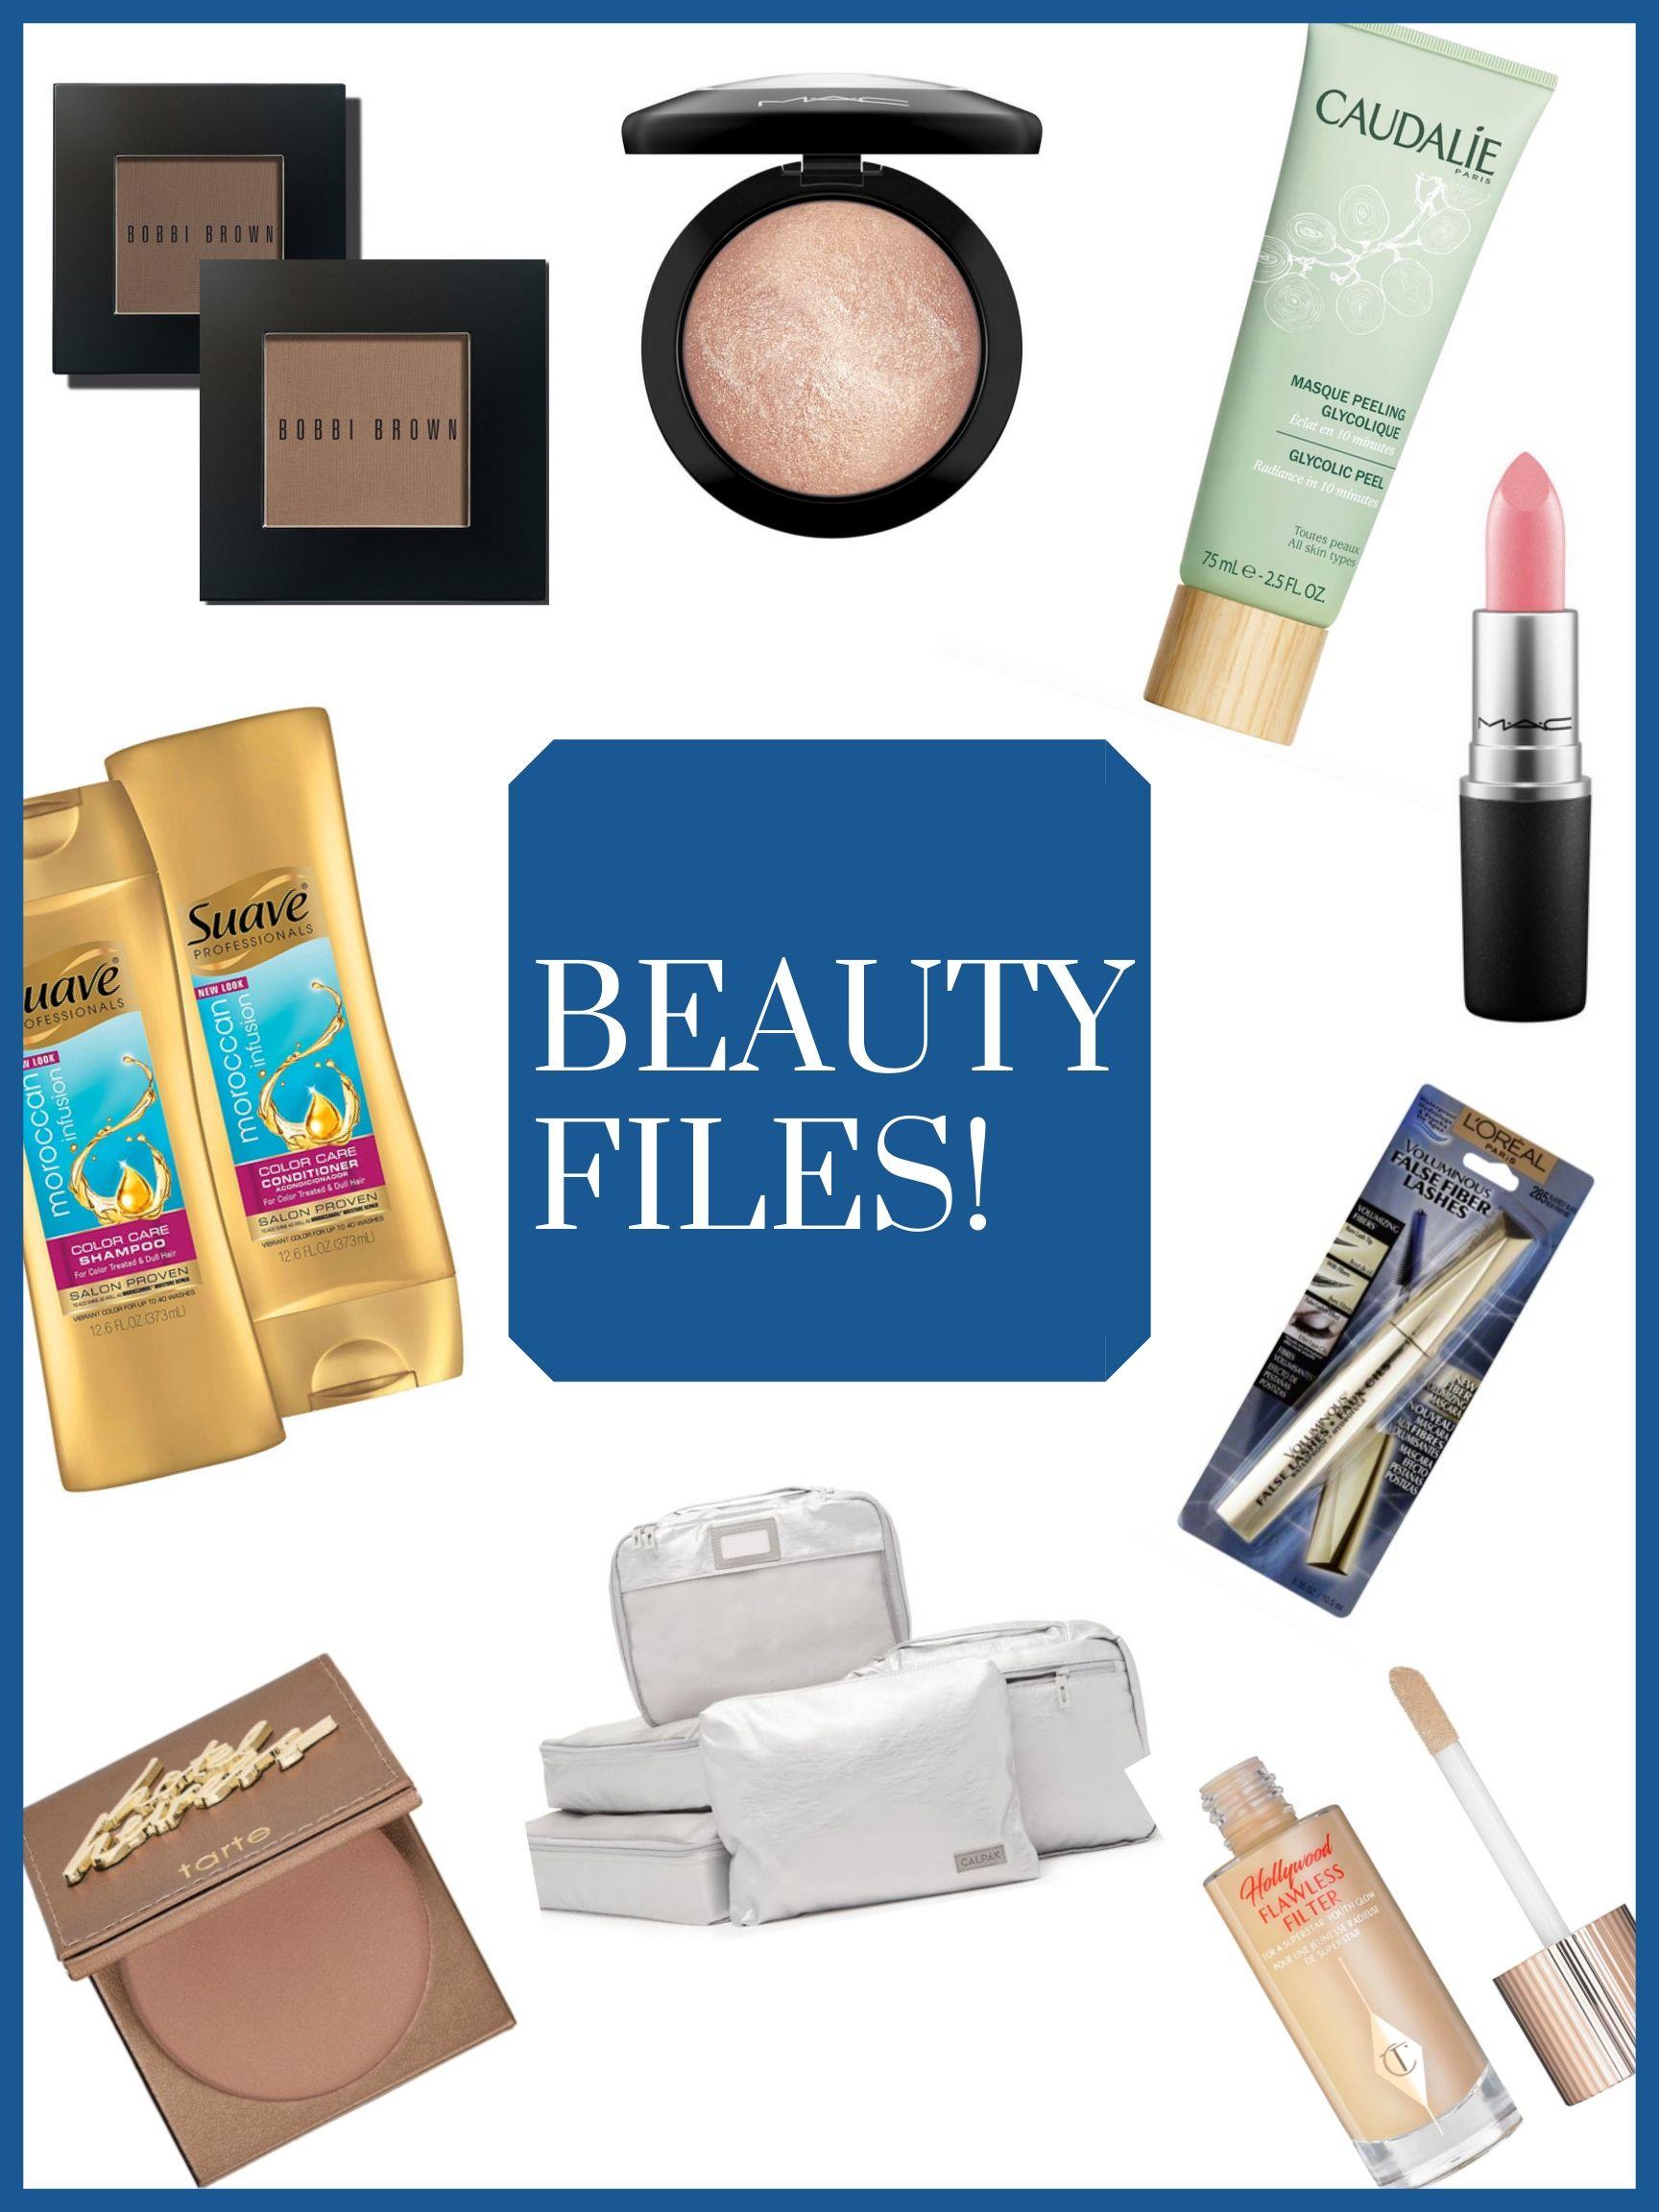 Beauty files